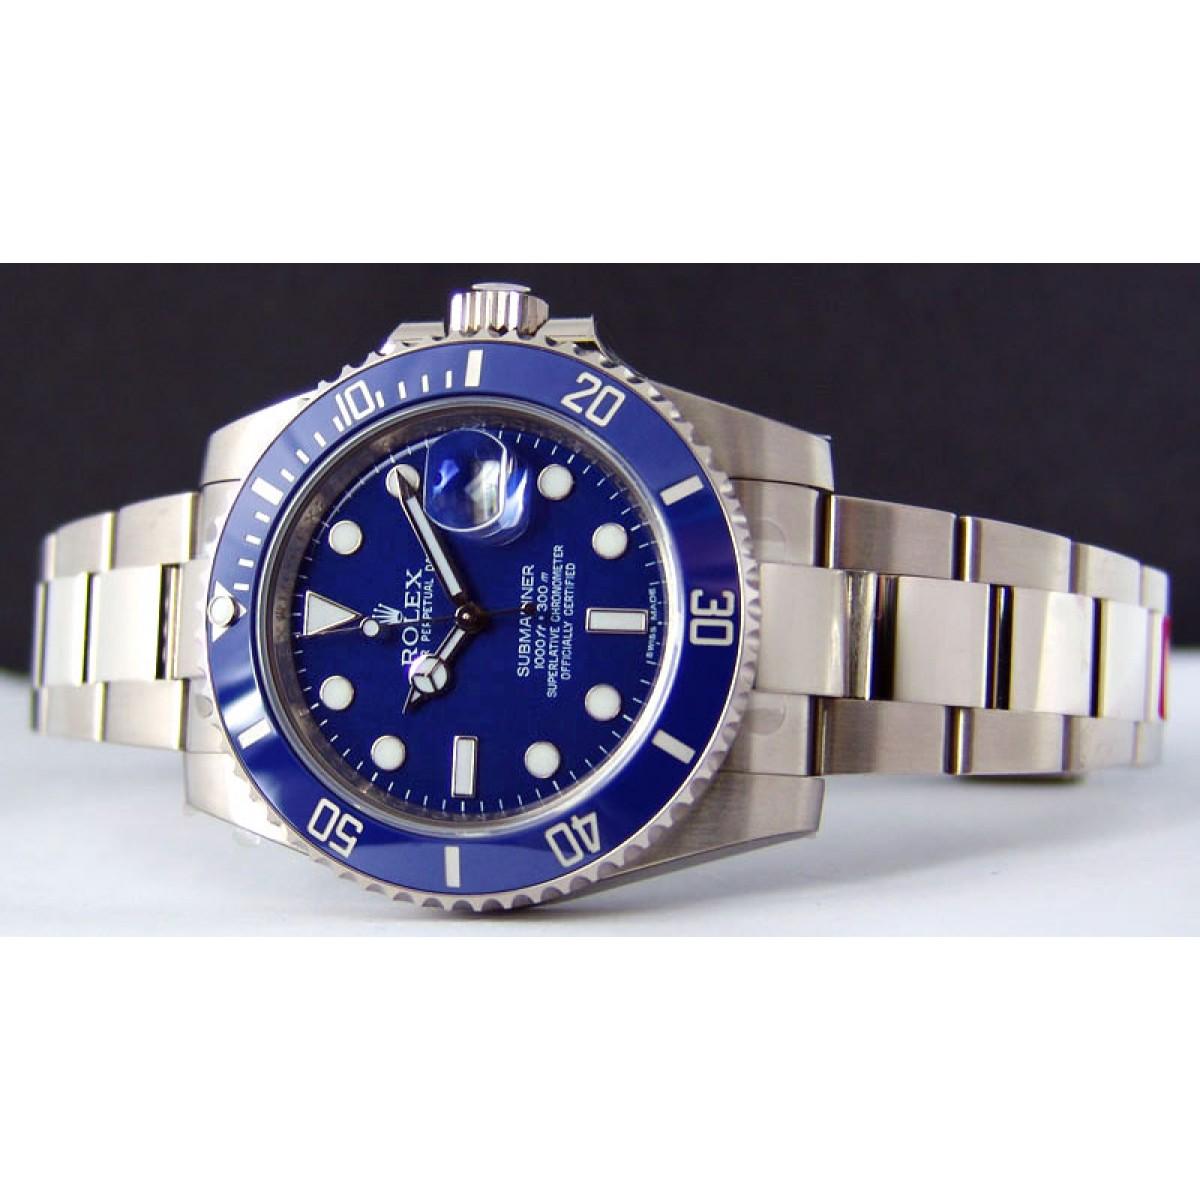 A Rolex Submariner Replica timepiece with Blue Dial ...